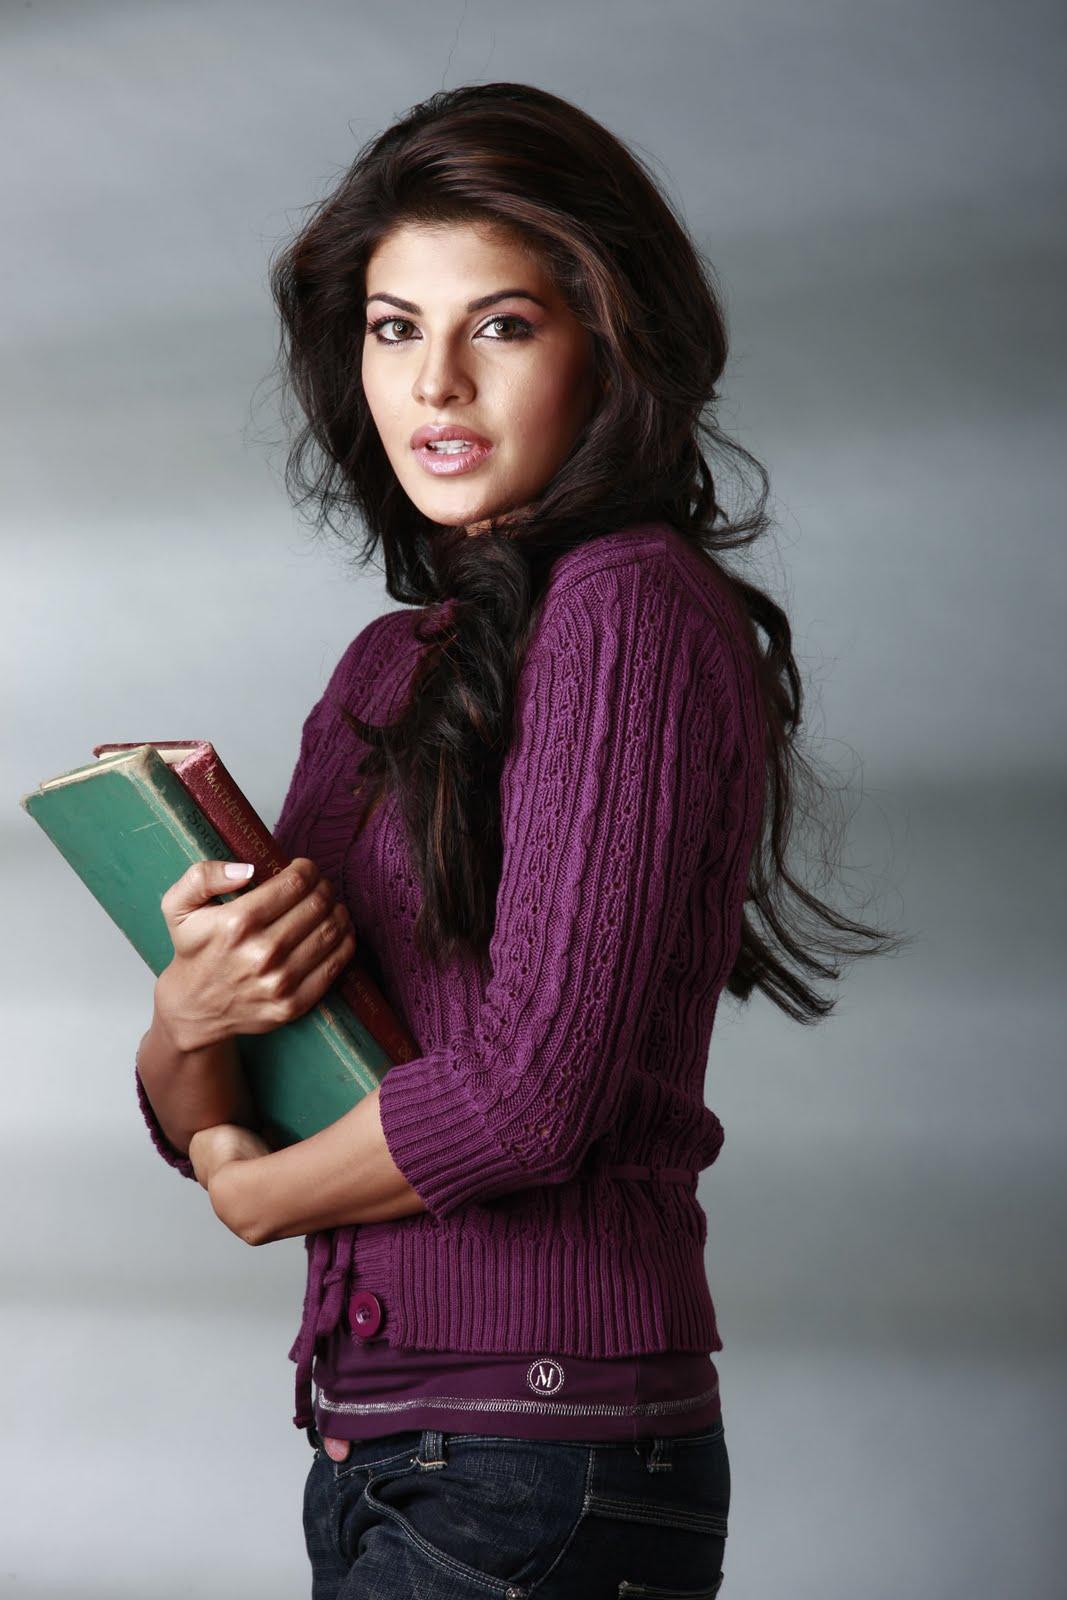 Indian Hot And Bollywood Hot Wallpaper Murdar 2 And Hot -3774